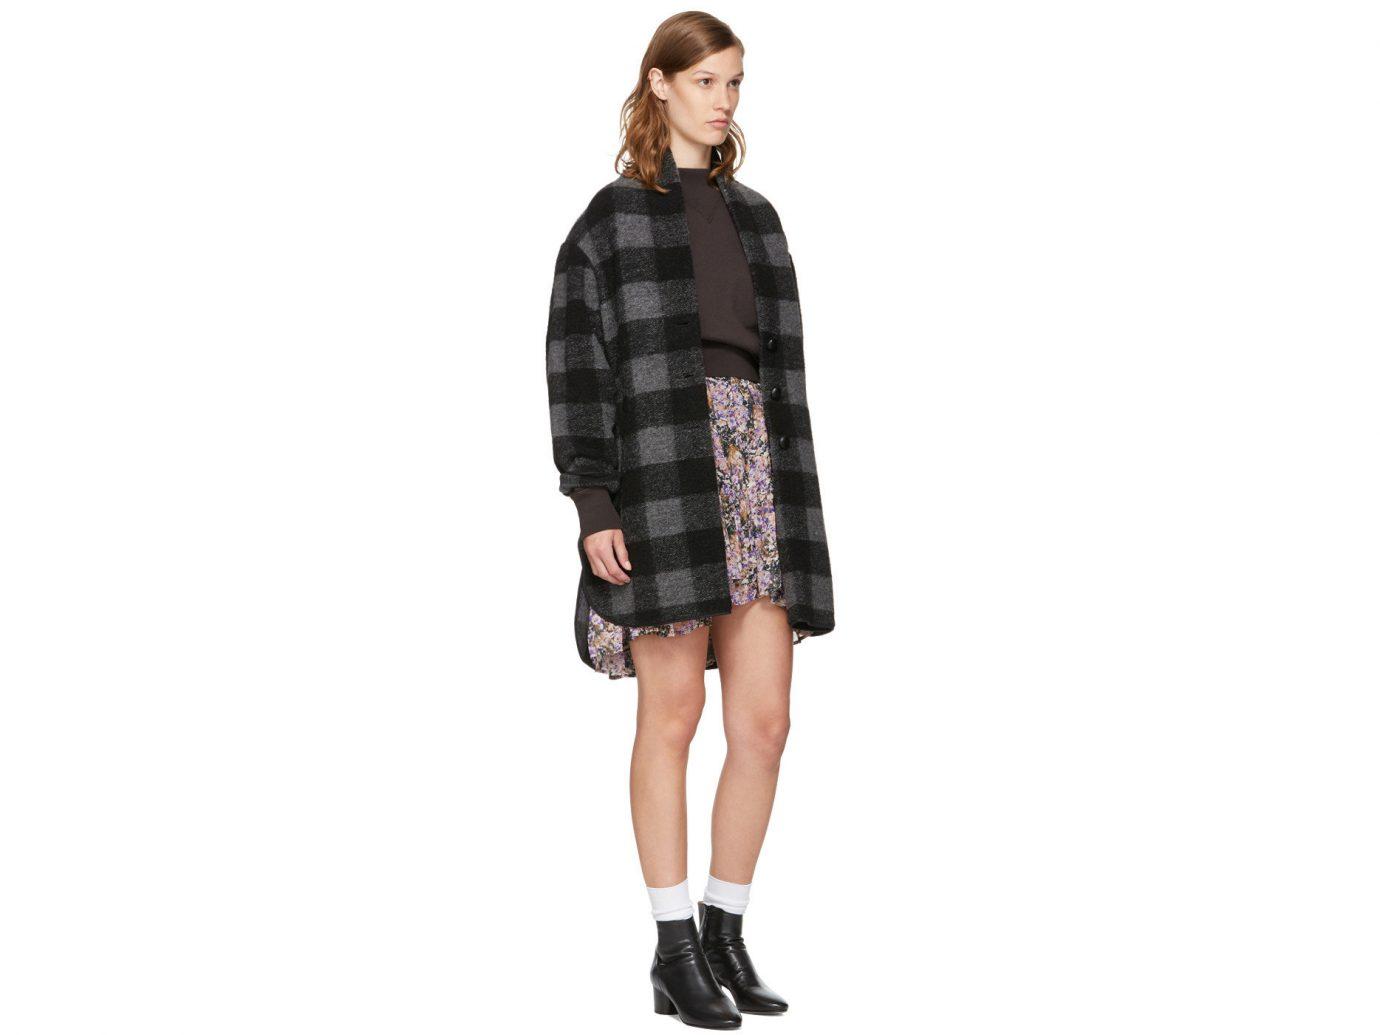 Travel Shop clothing tartan shoulder pattern fashion model plaid Design coat joint sleeve shoe